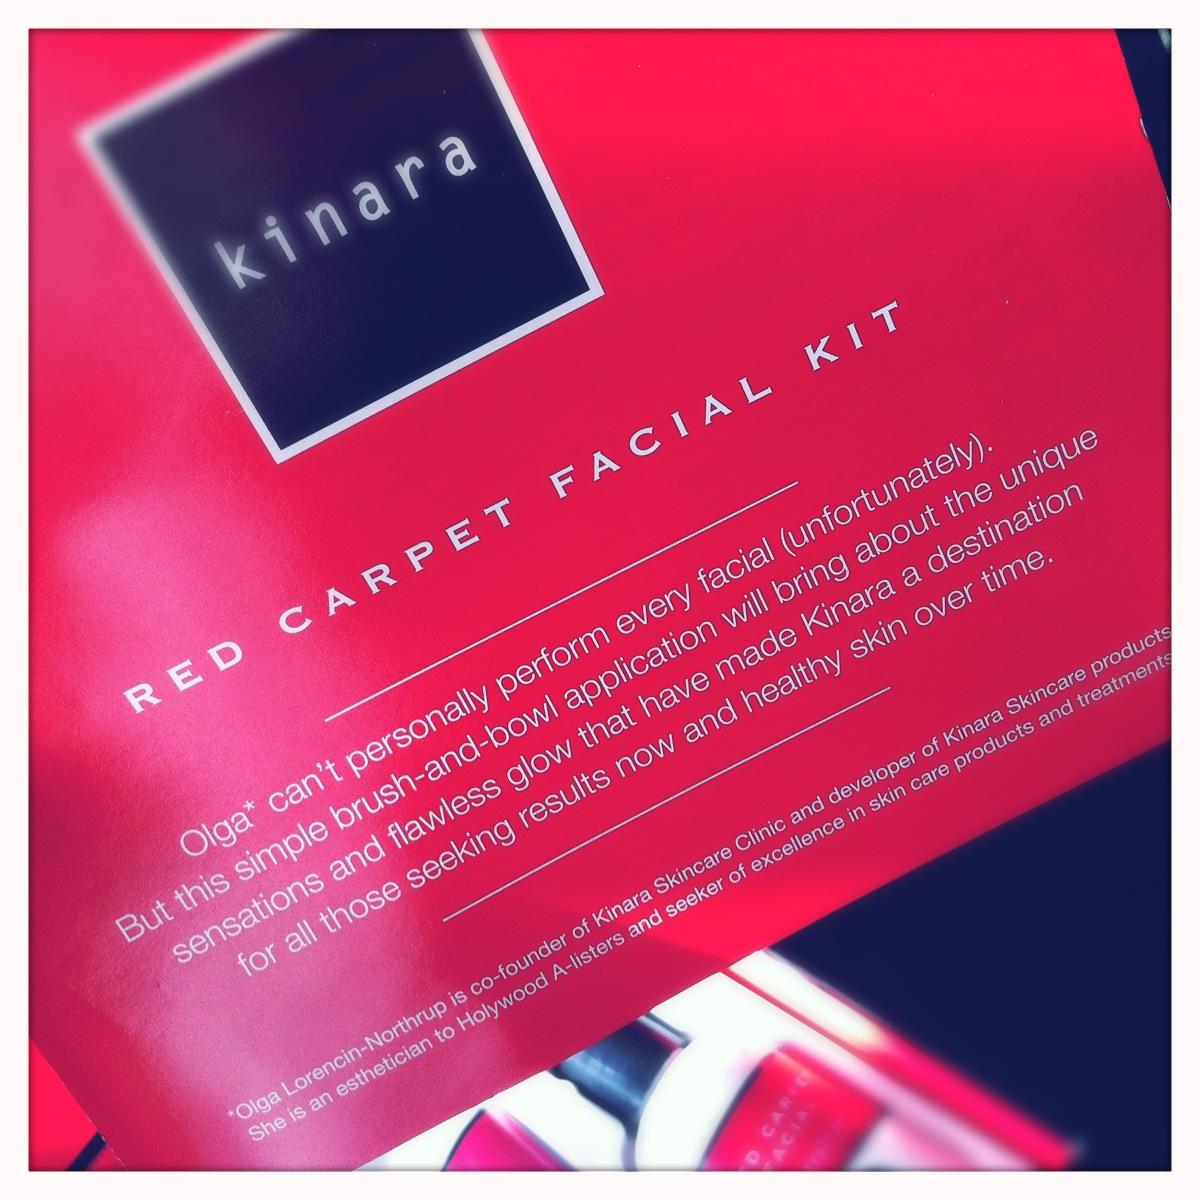 kinara red carpet facial kit instructions